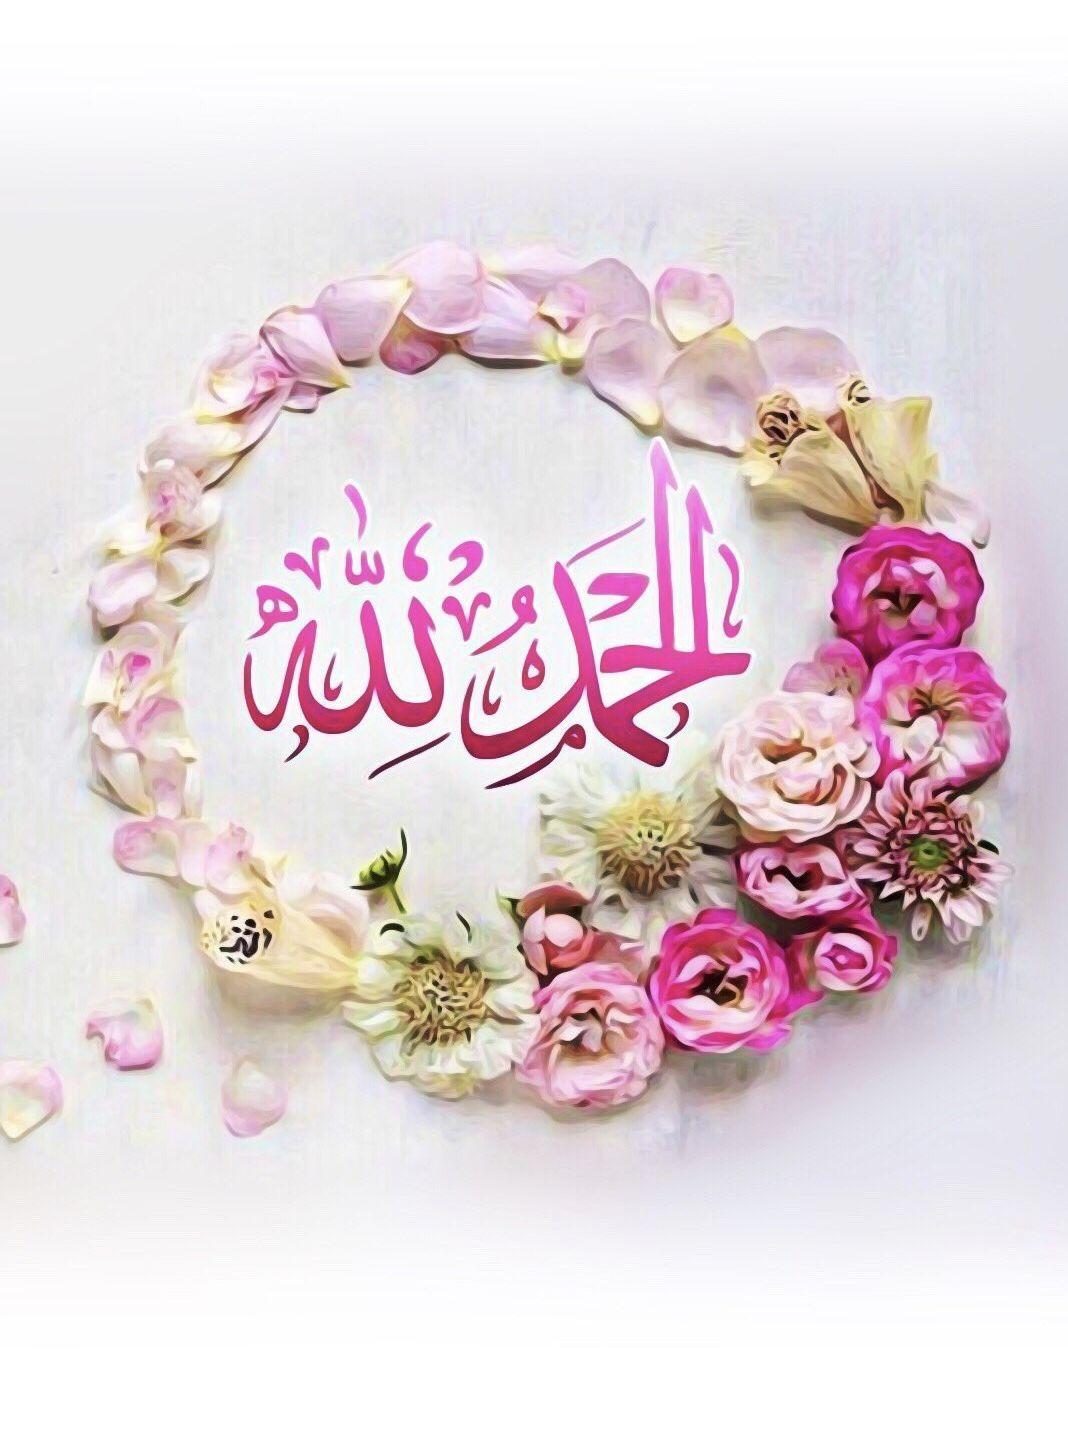 Pin By Steffanie Noro On ذ كر وإستغفار Islamic Art Pattern Islamic Wallpaper Islamic Paintings